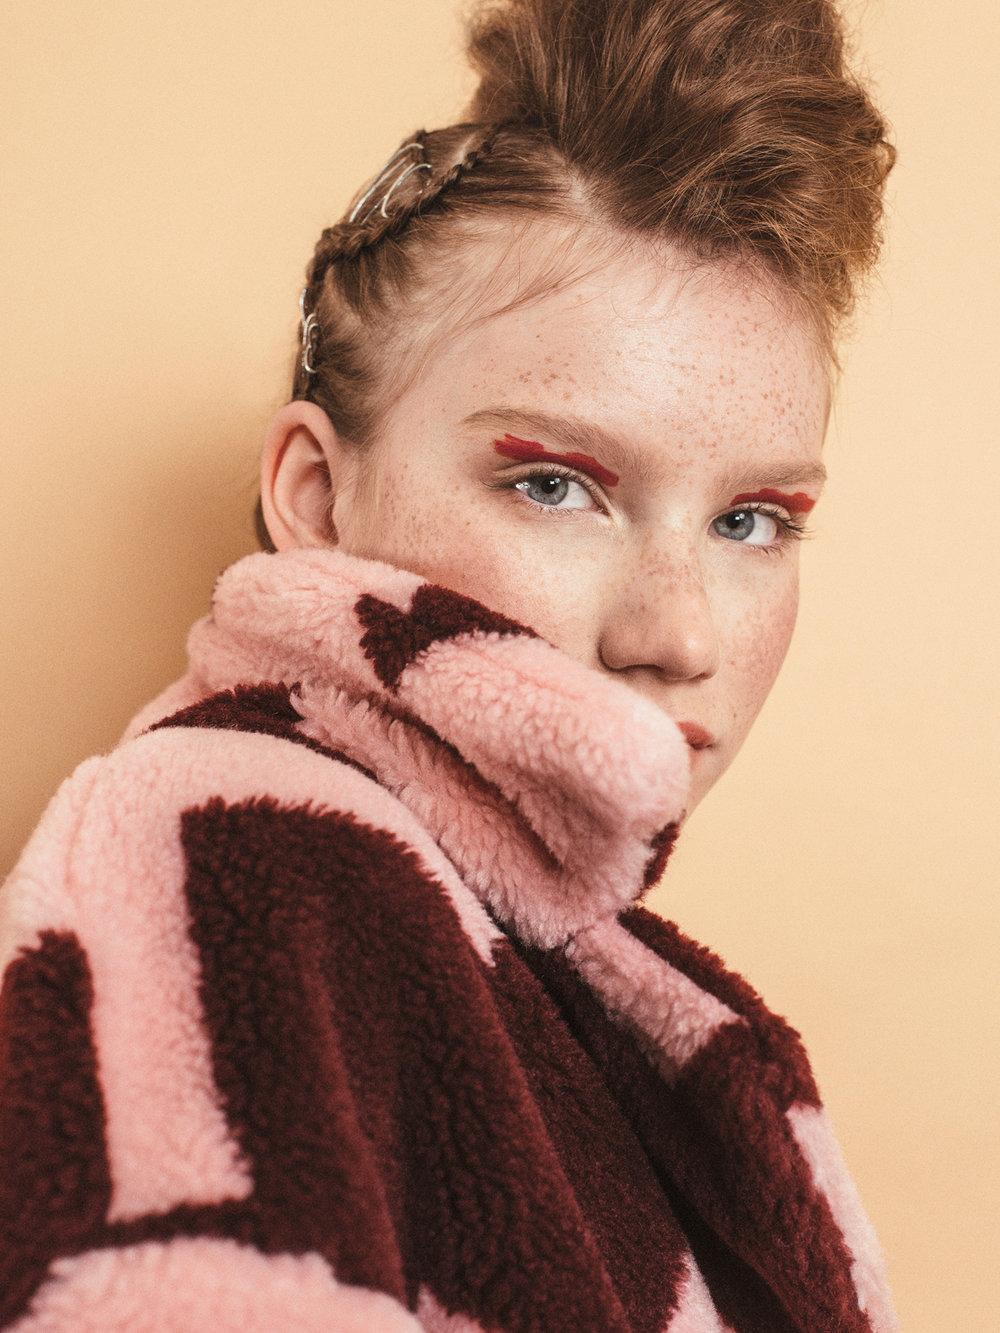 Aboutthatlook Ninni Tokalija, Maria Wahlström, Emma Grann, Elin Braid, Studio Emma Svensson for Lucys Magazine